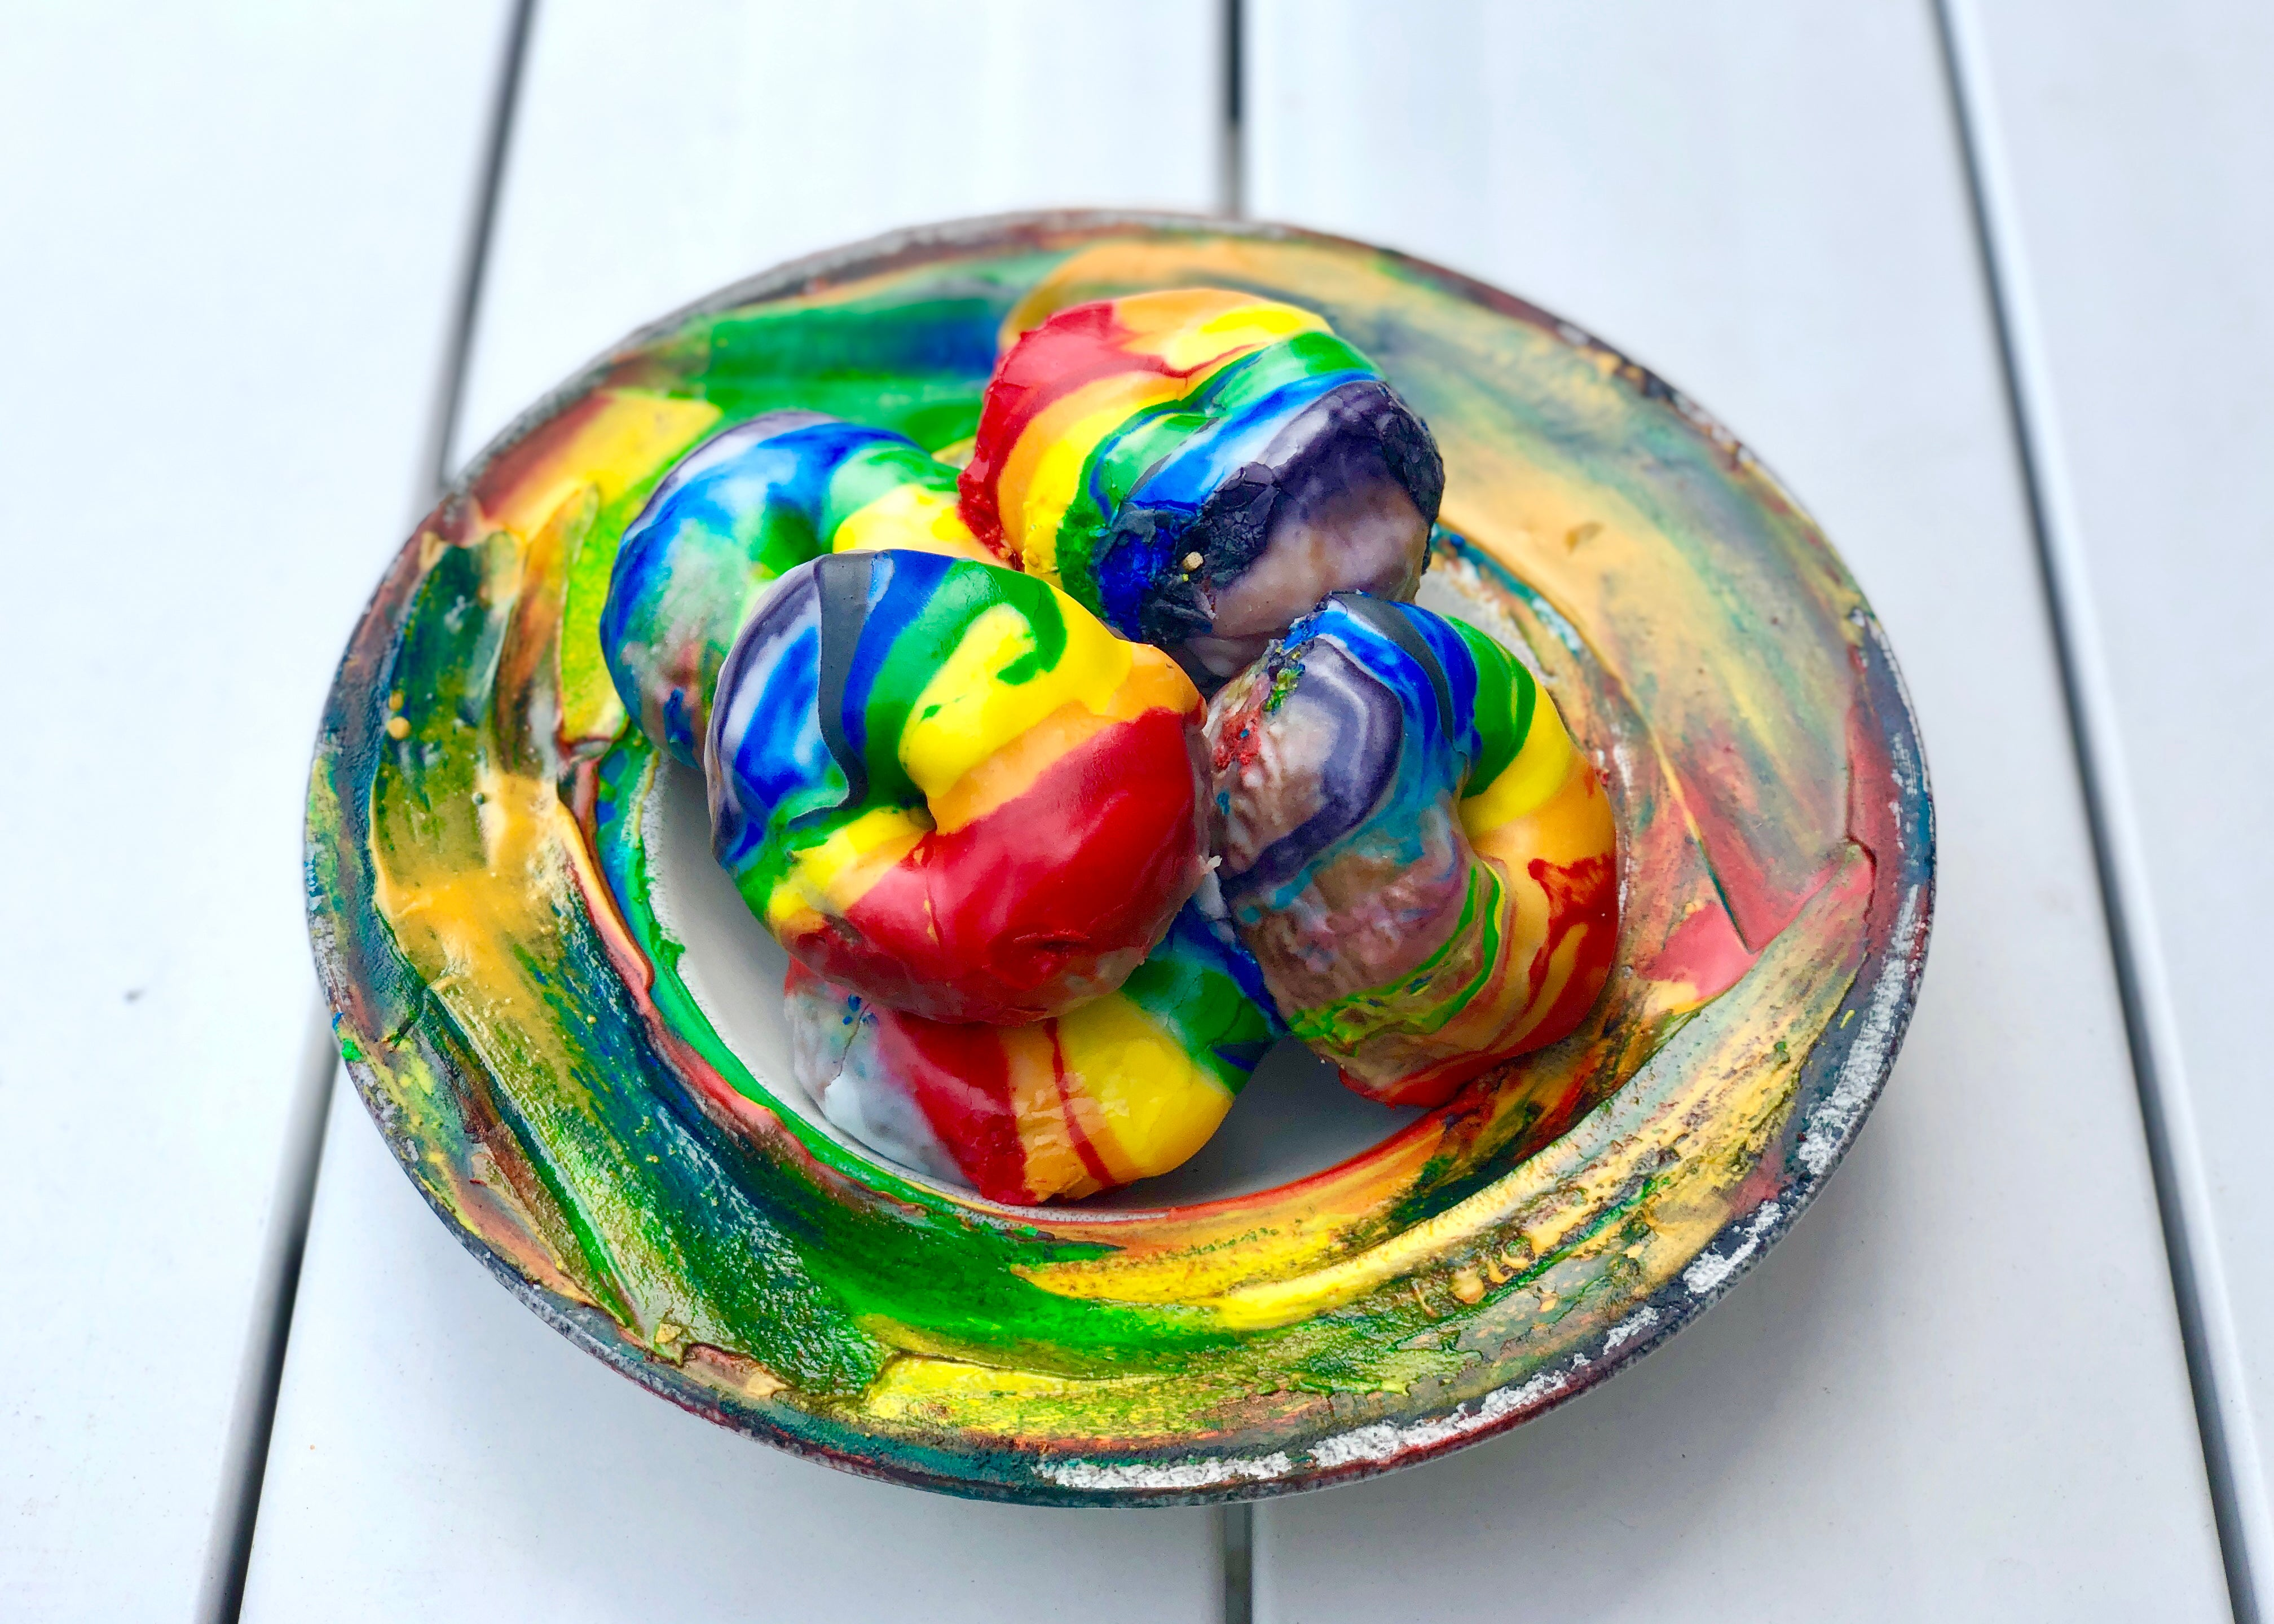 Funfetti Brioche Donut with Rainbow Glaze at OAK